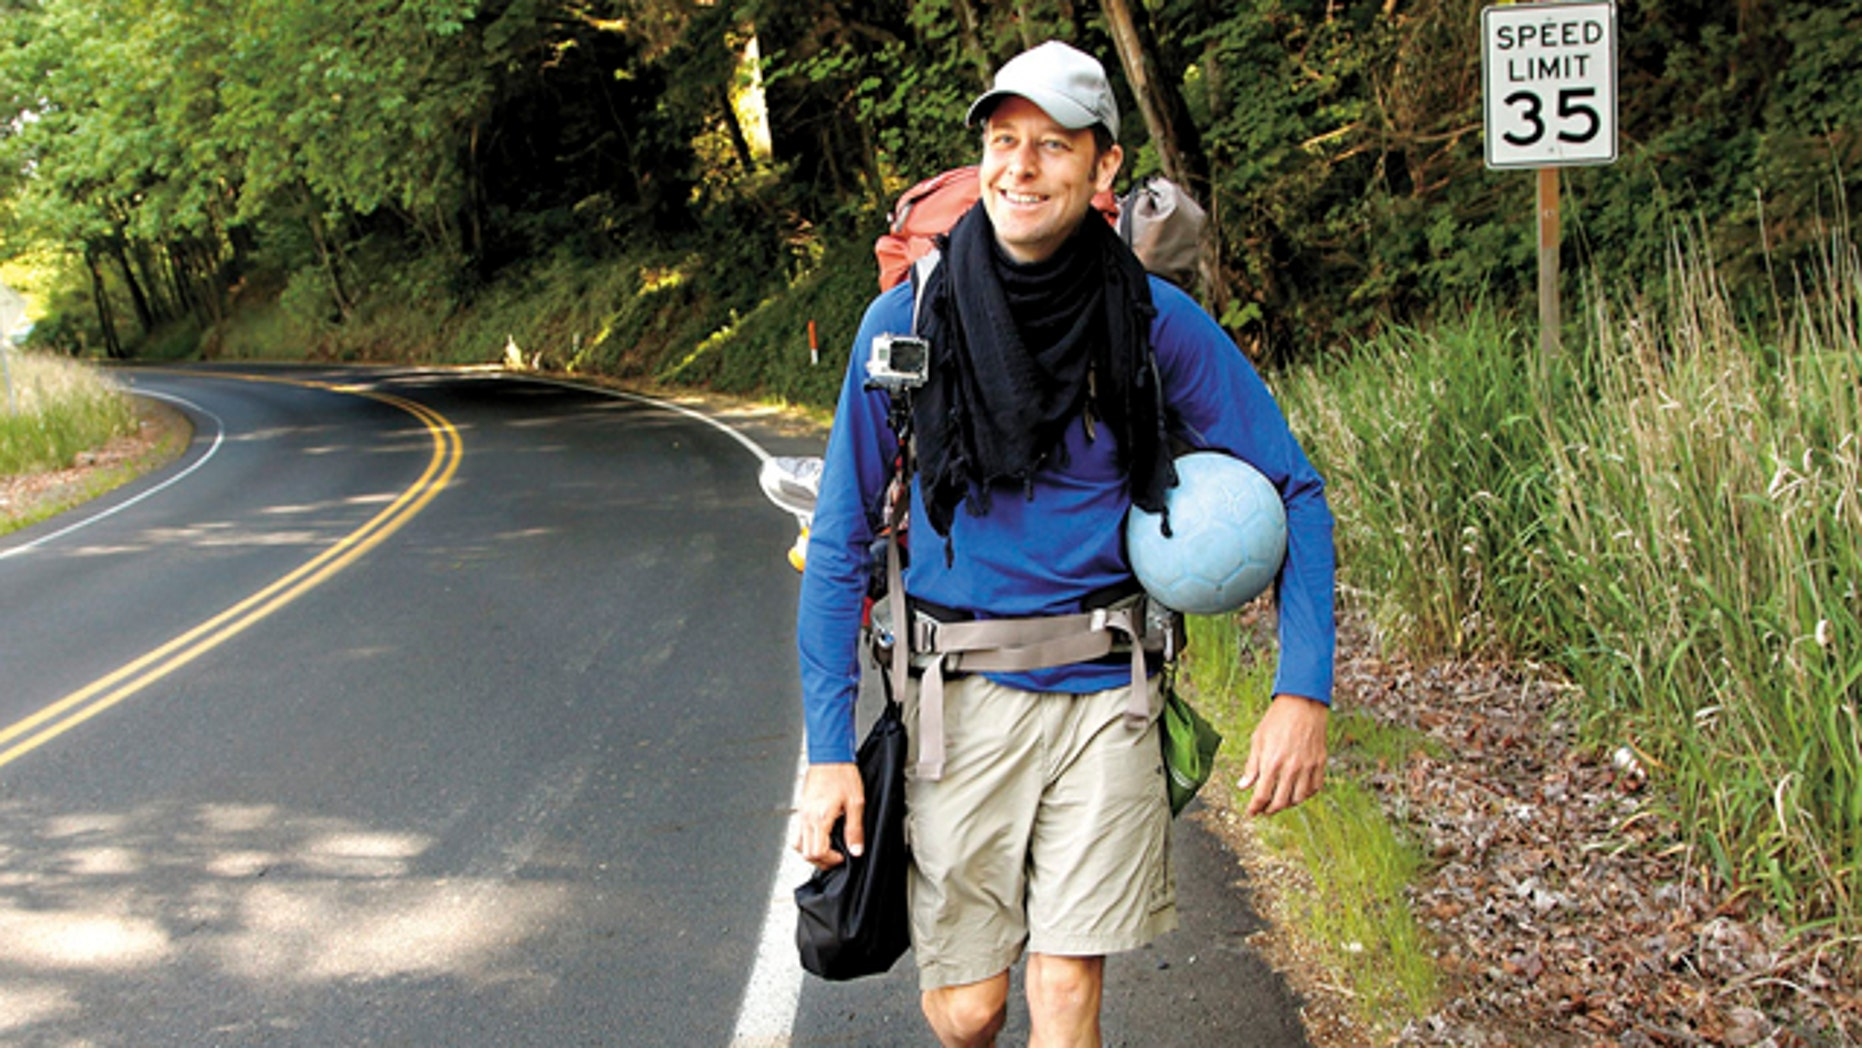 May 7, 2013: Richard Swanson, of Seattle, walks along a road in Kelso, Wash.